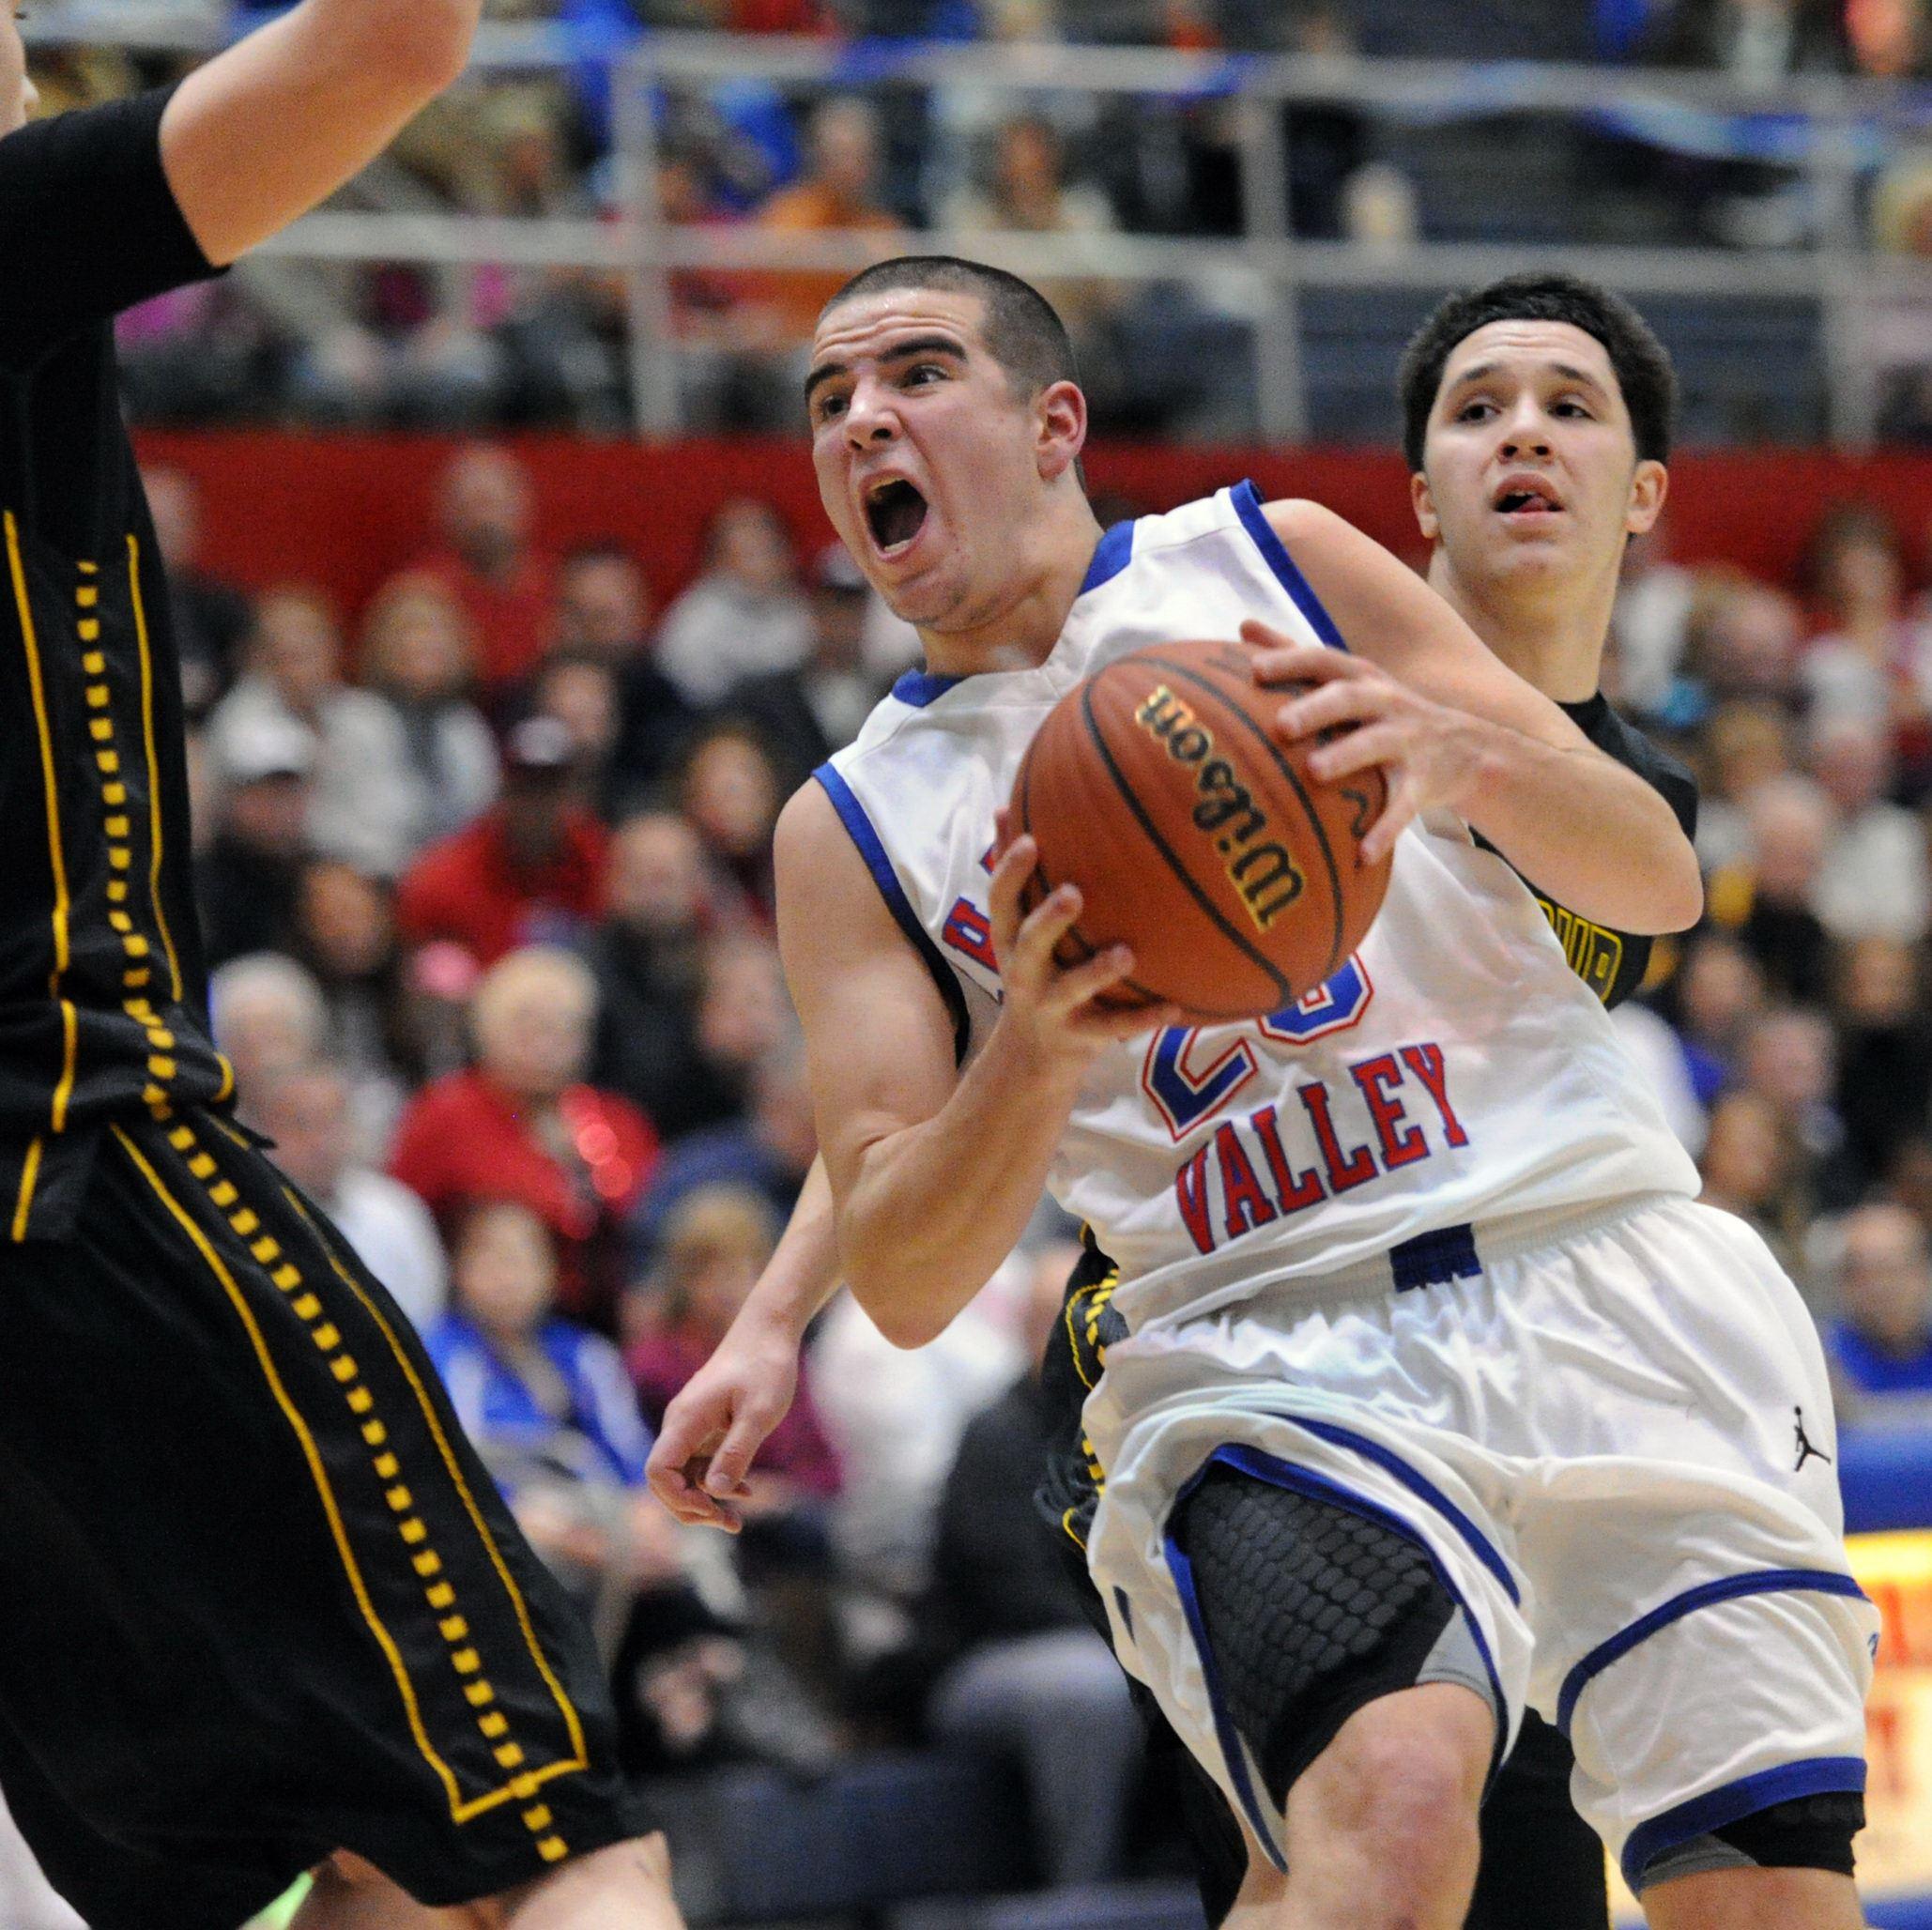 Wpial Playoff Bracket   Basketball Scores